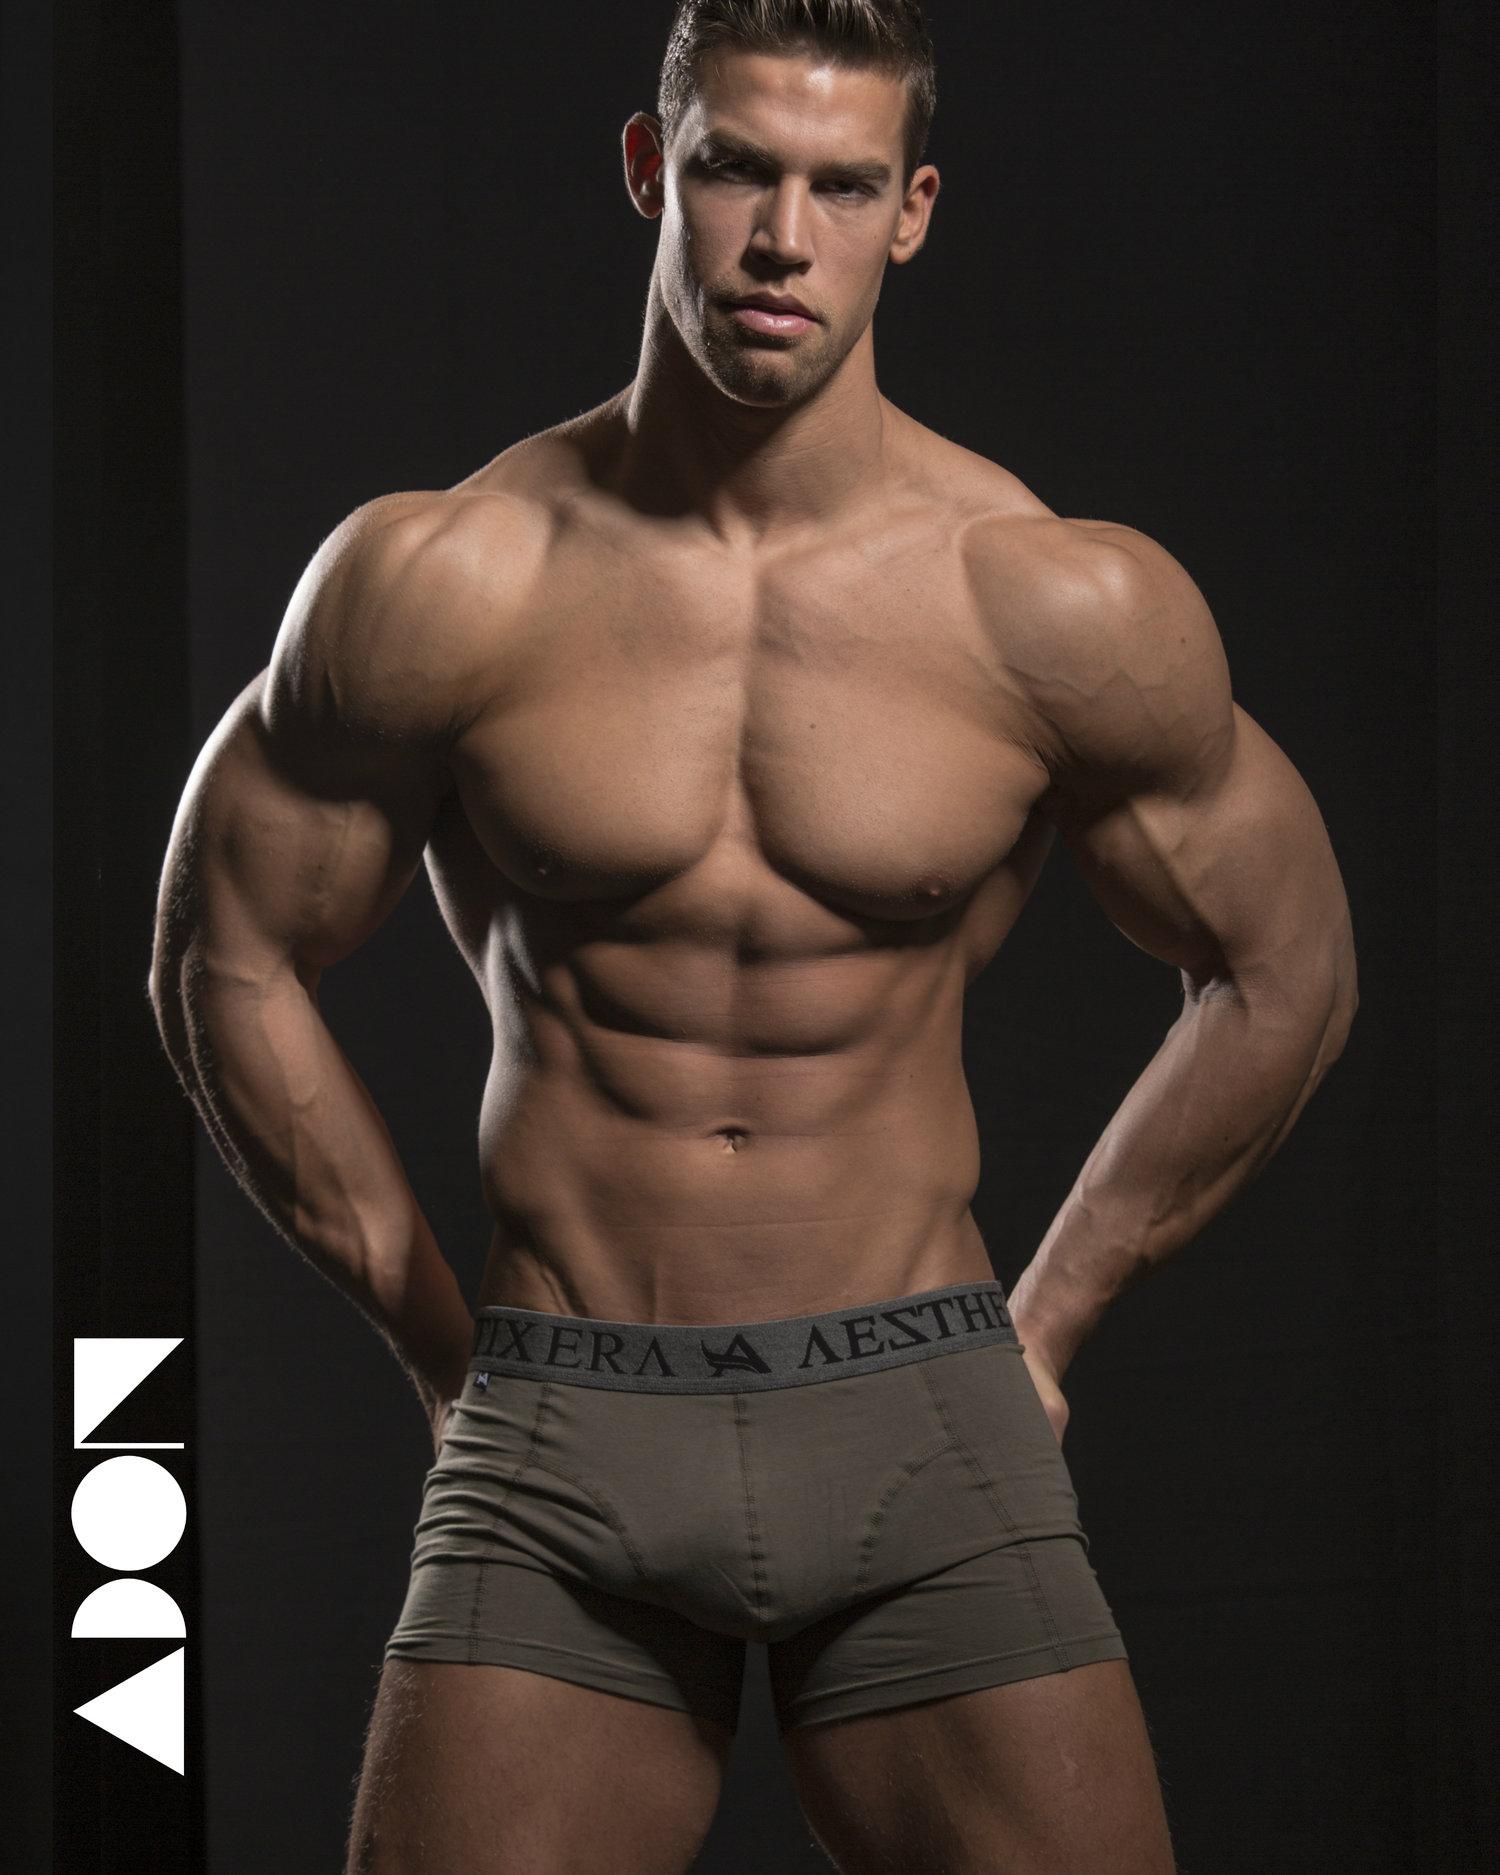 CSABA SZIGETI Model and bodybuilder